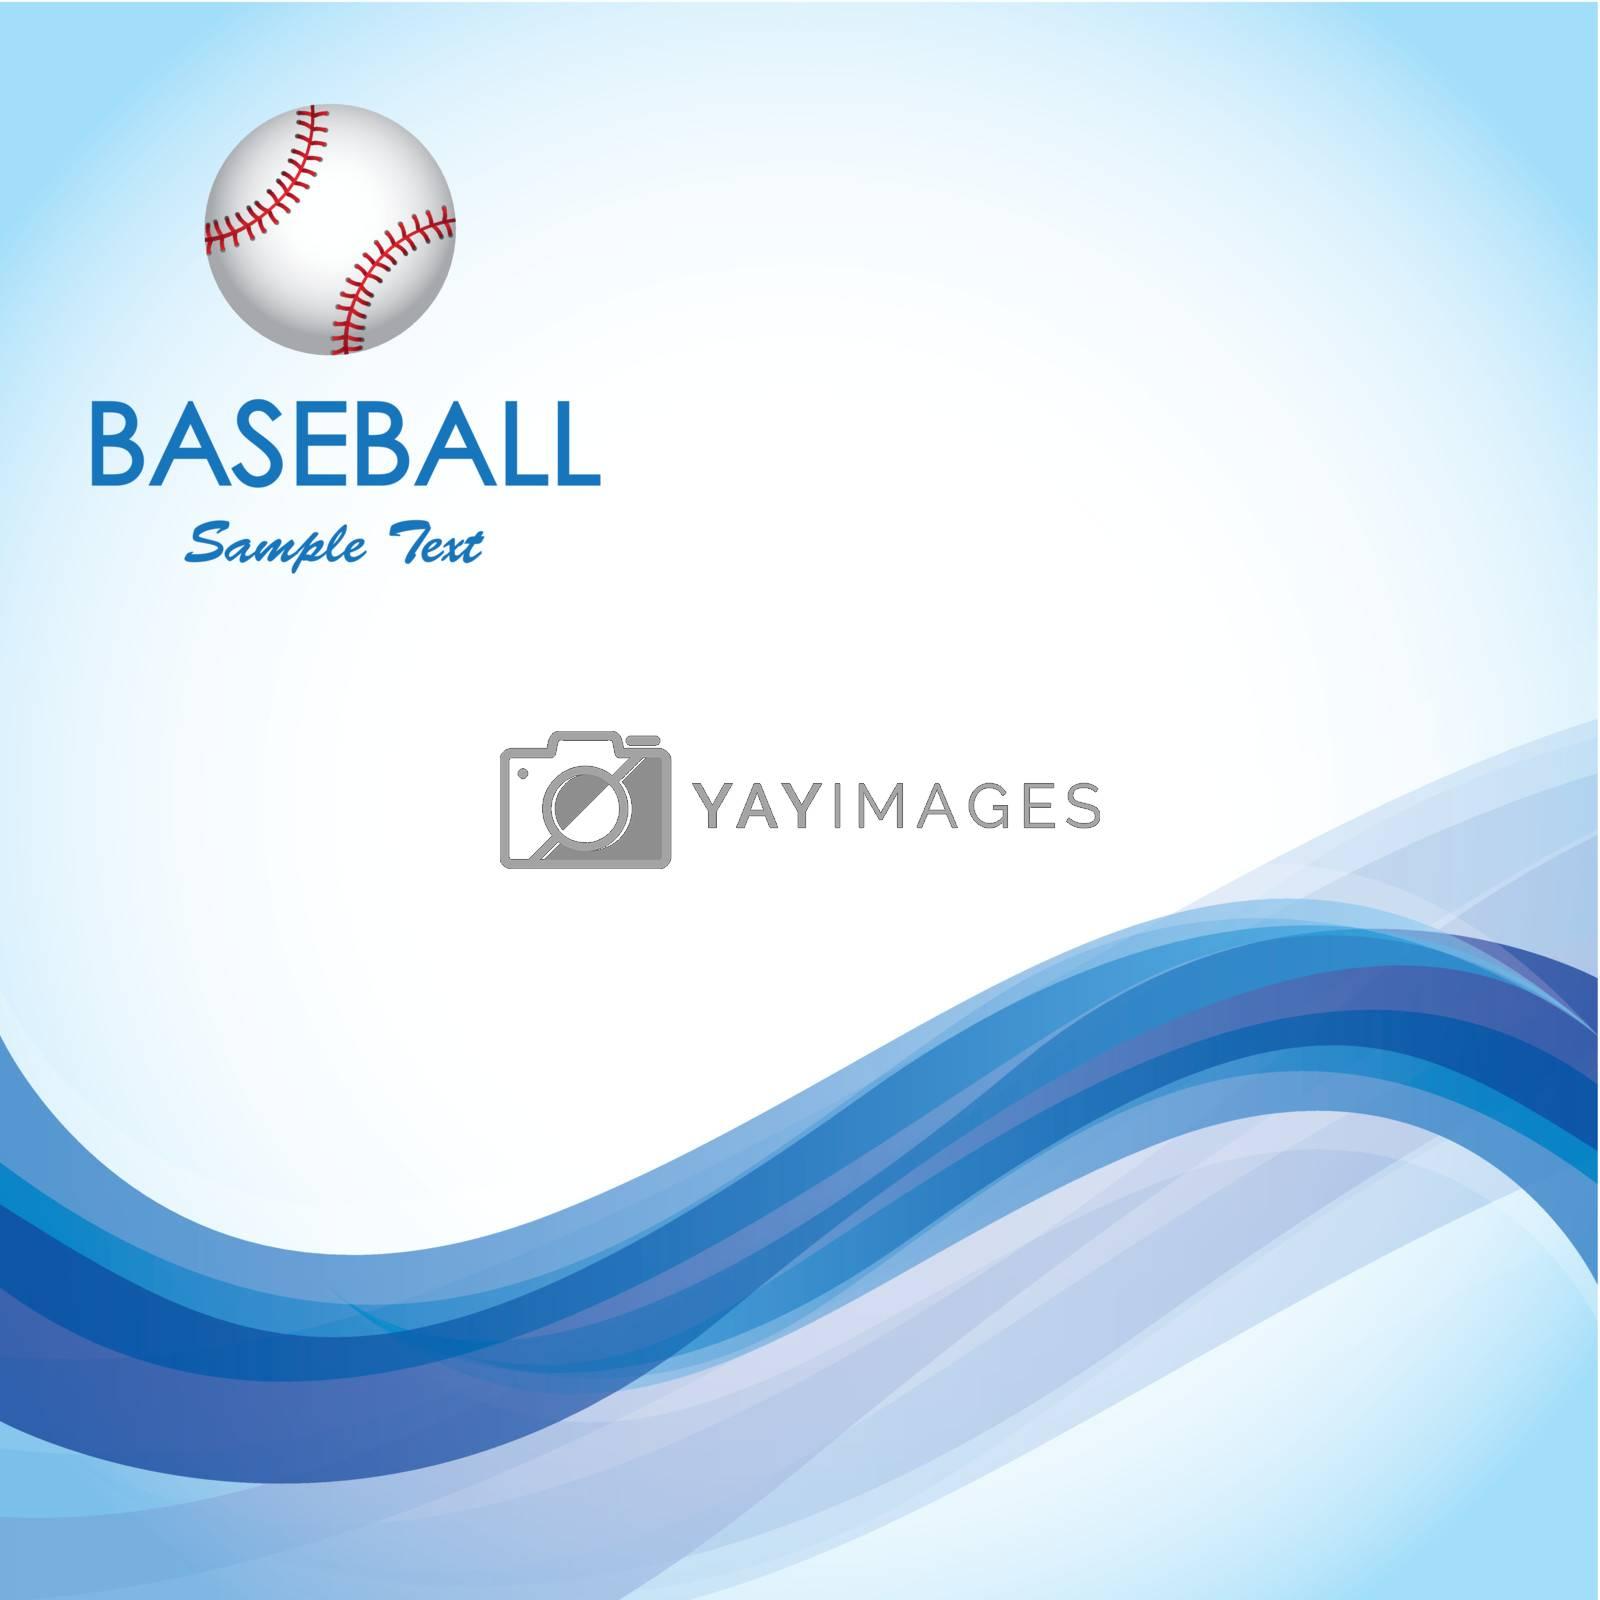 Ball of baseball over blue wave over blue background vector illustration